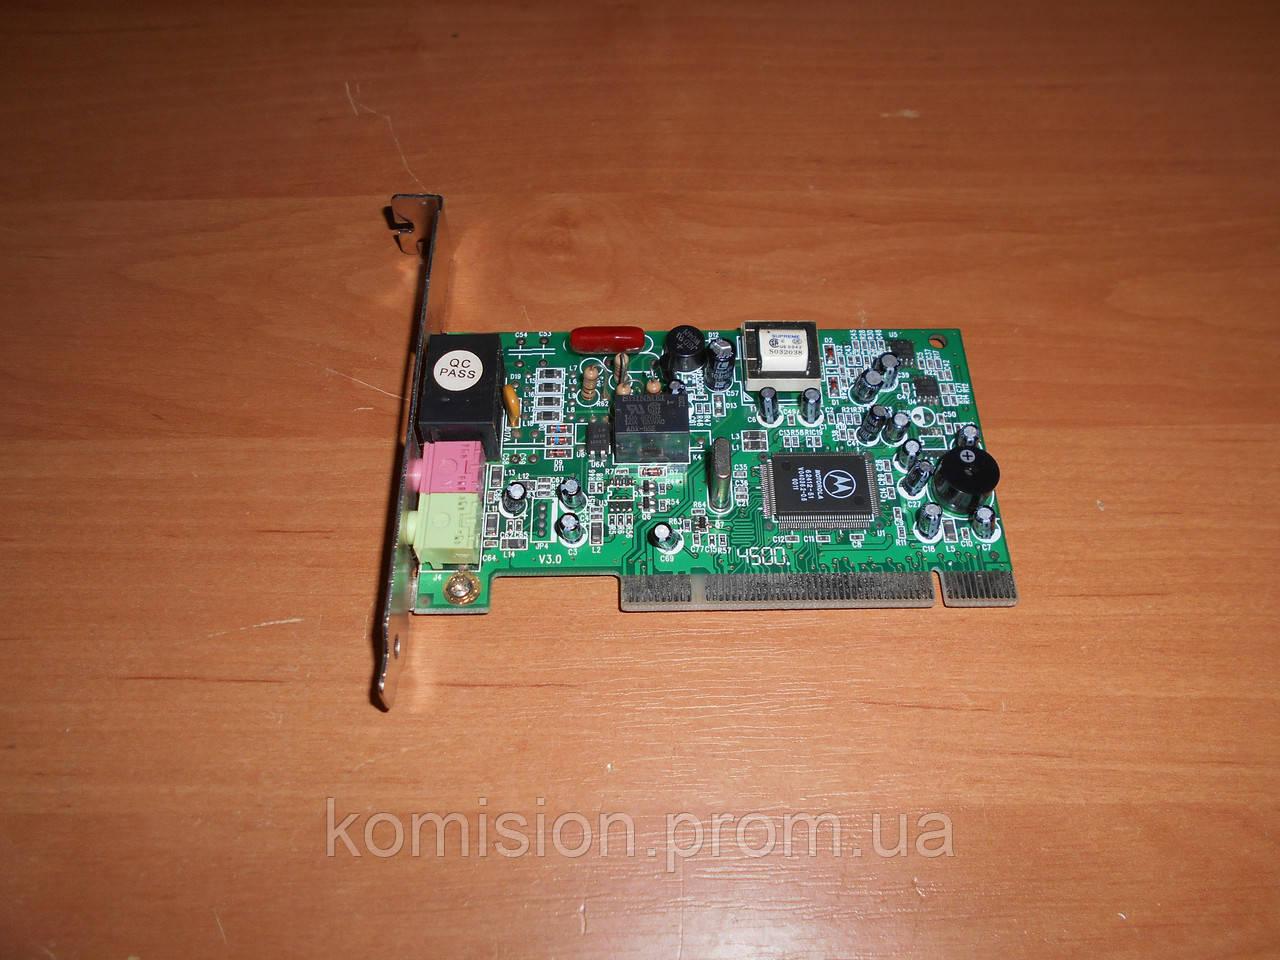 Fax Modem Motorola PCI